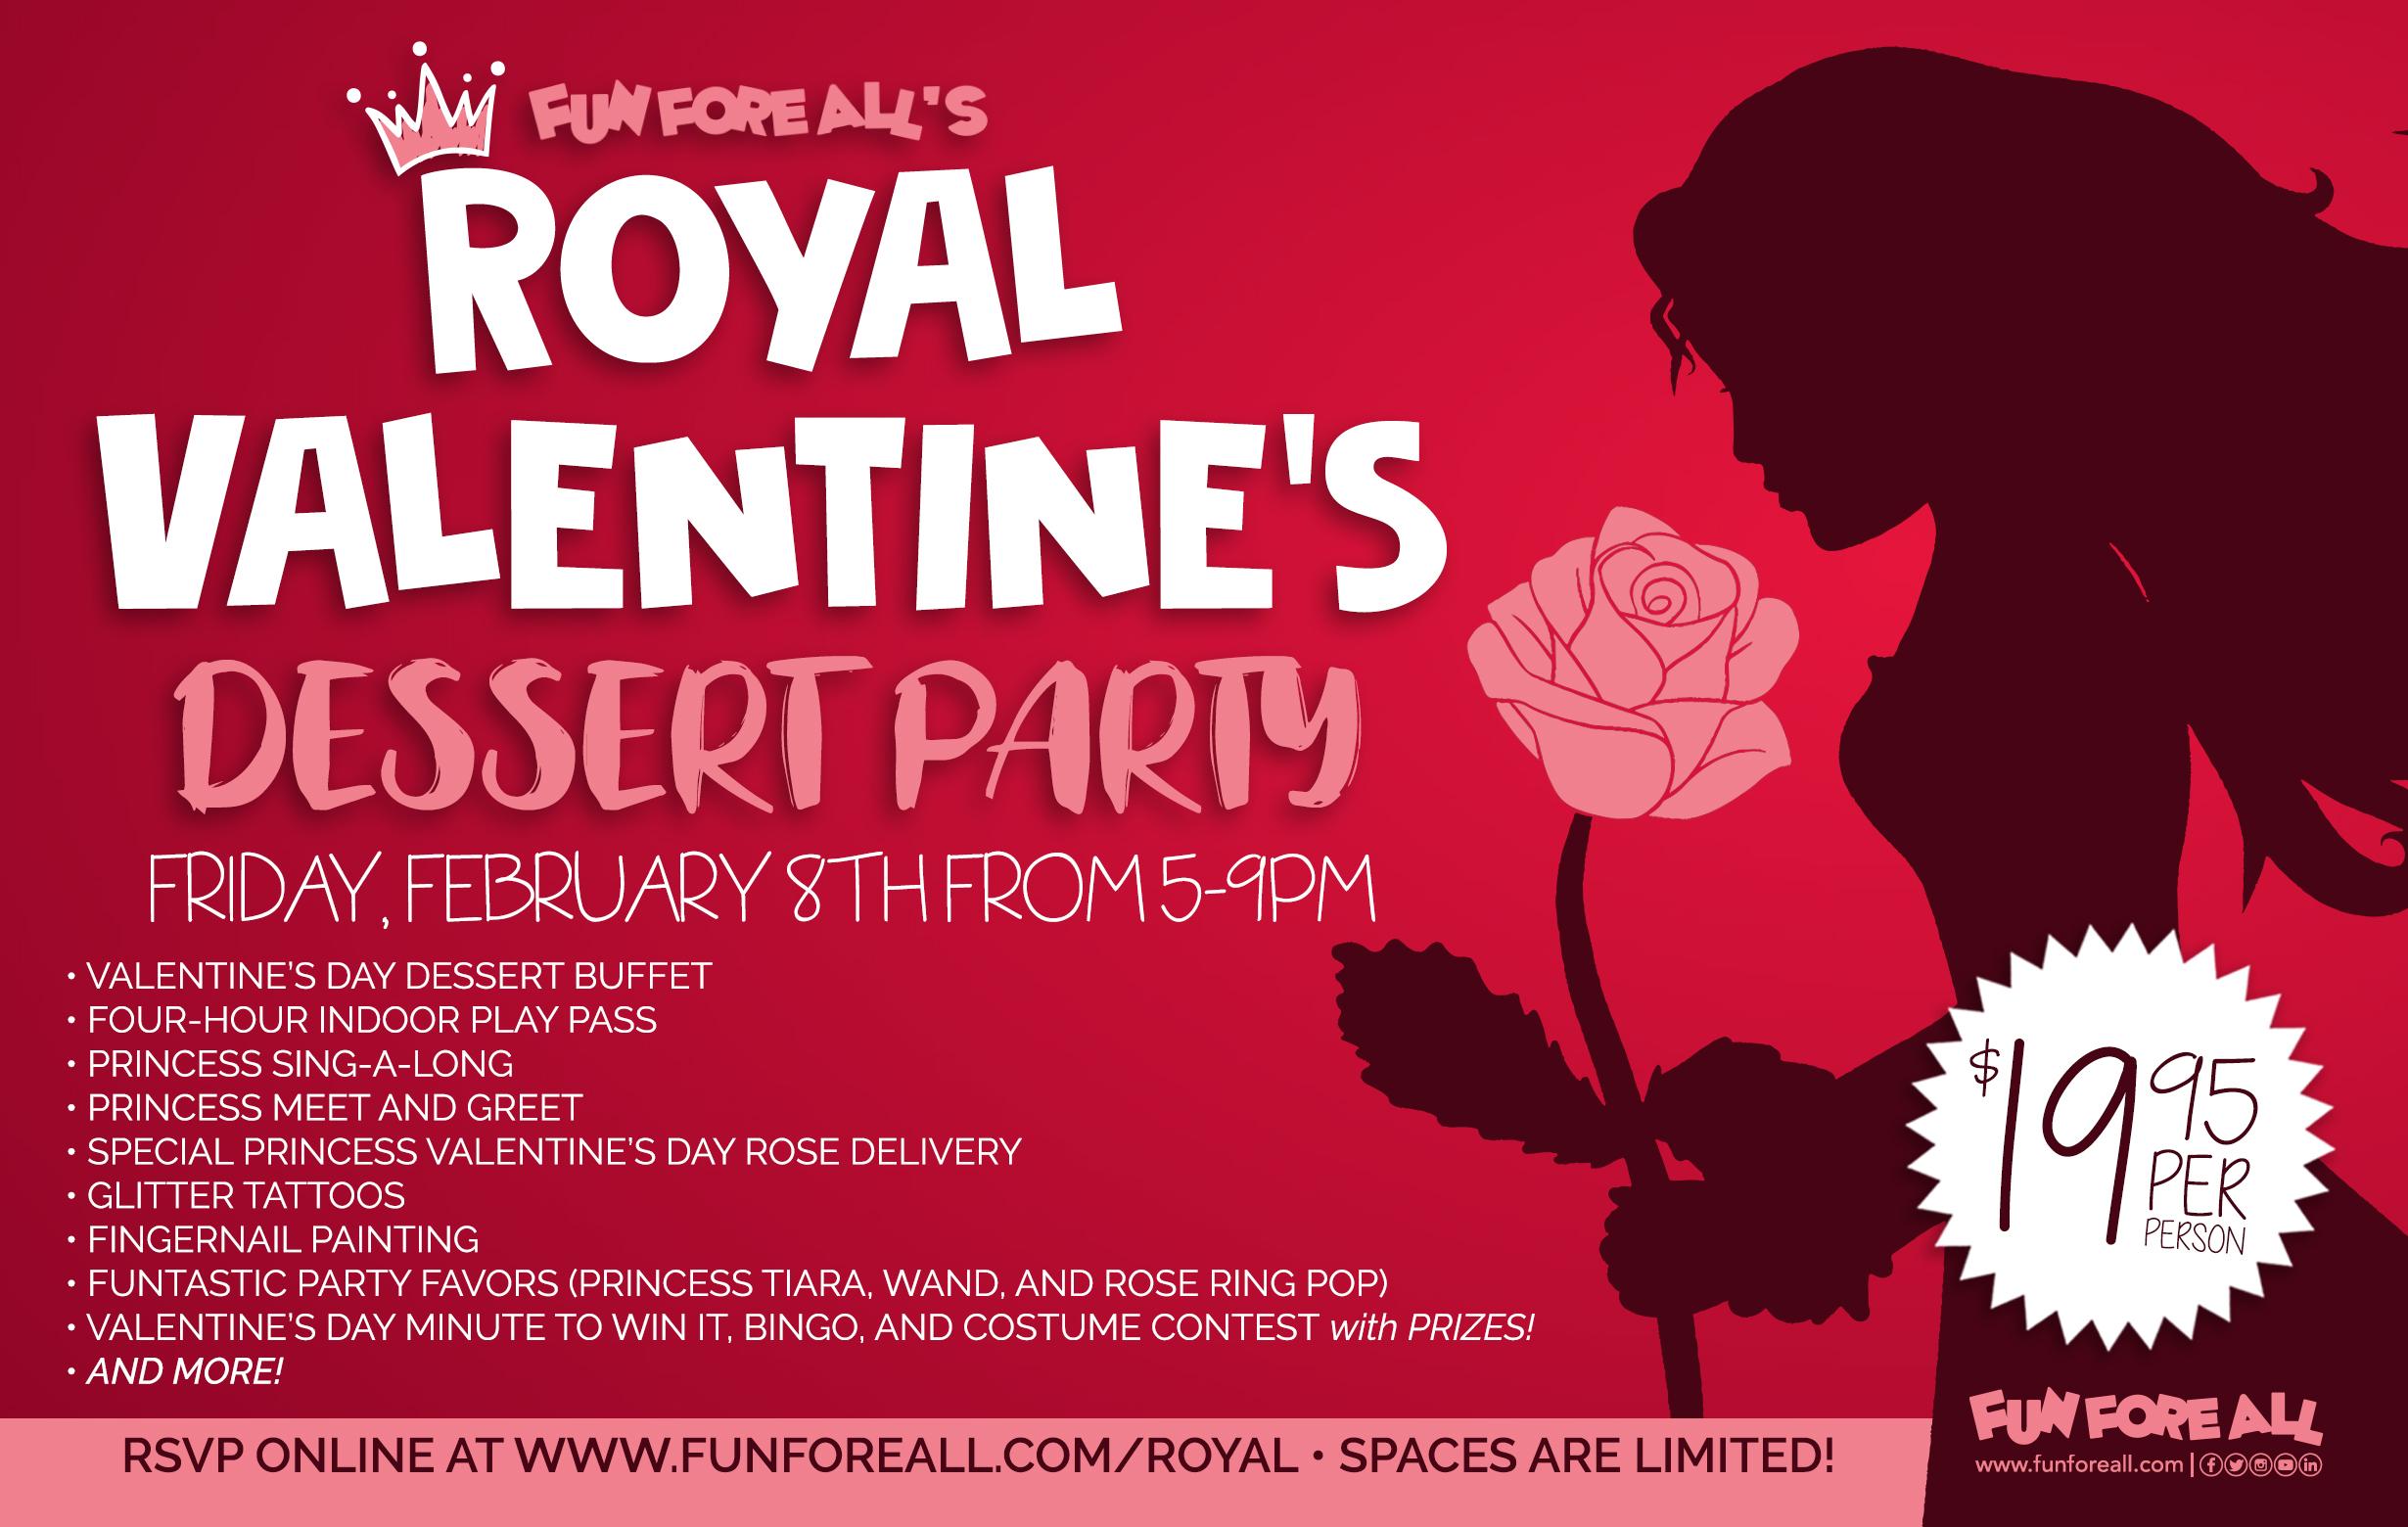 Royal Valentines Party 2019 Flyer.jpg